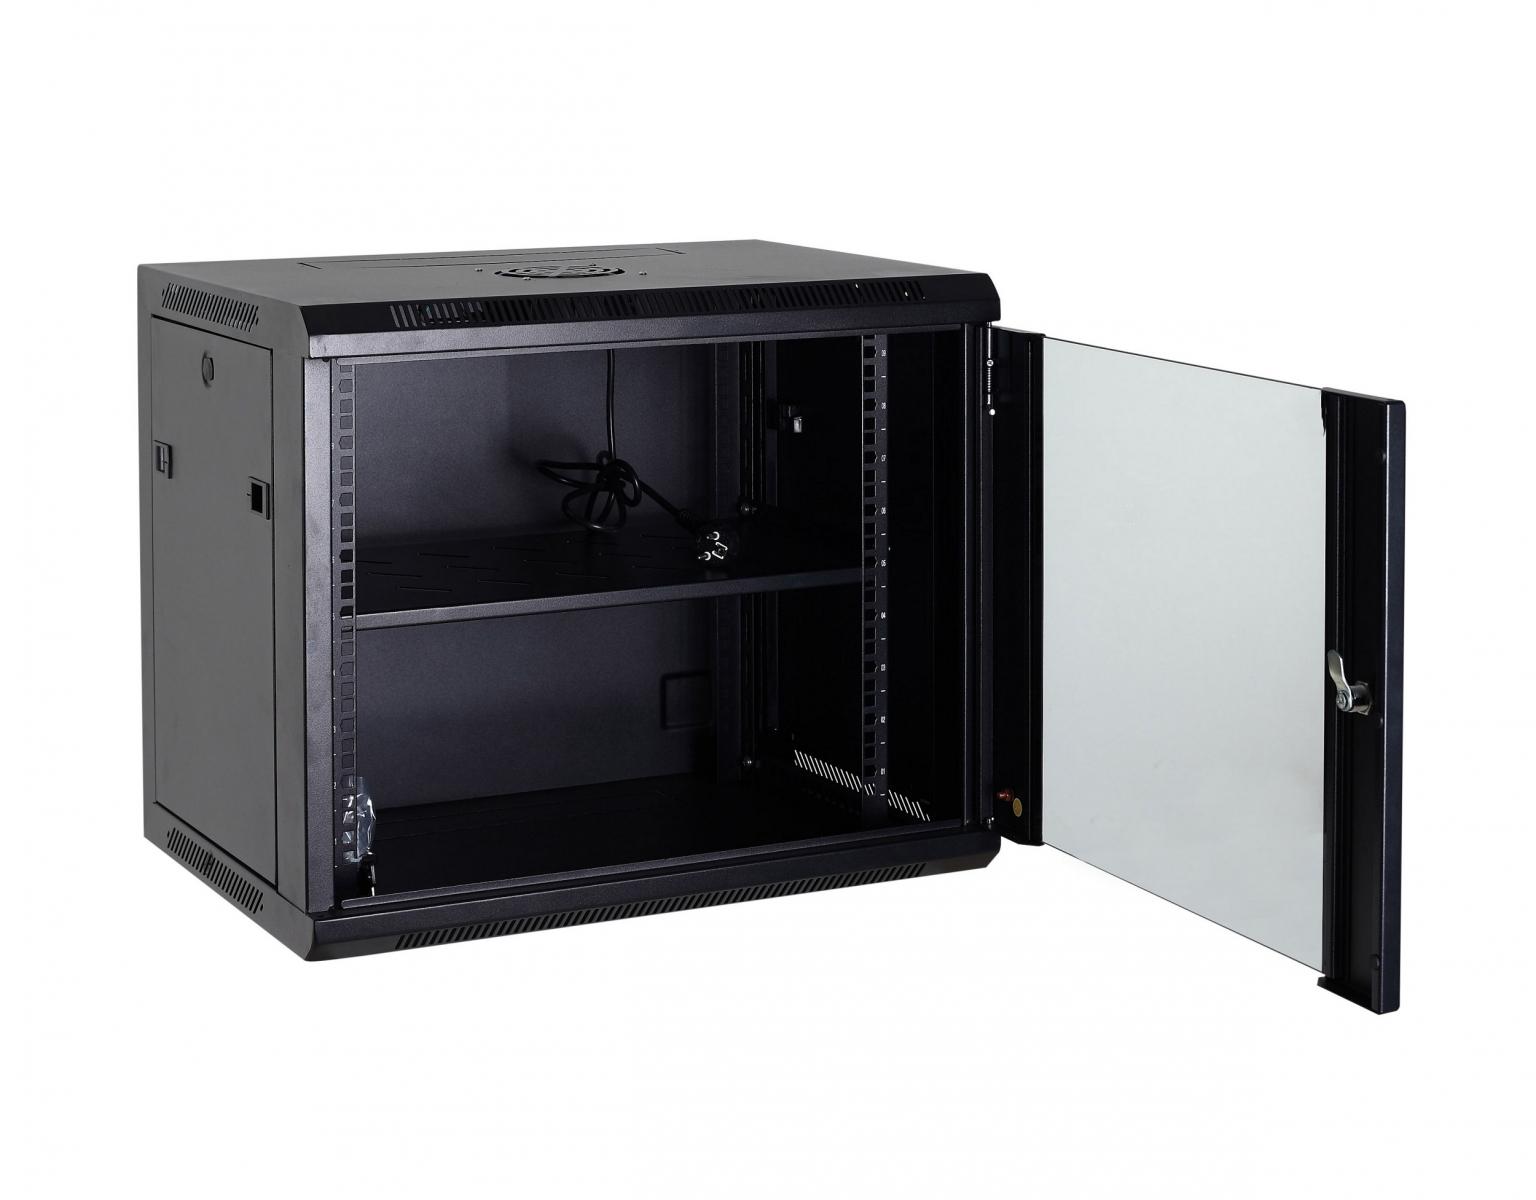 DigitMX NETPRO NP-C18U60W2F 19'' Wall Rack 18U 60cm with fan